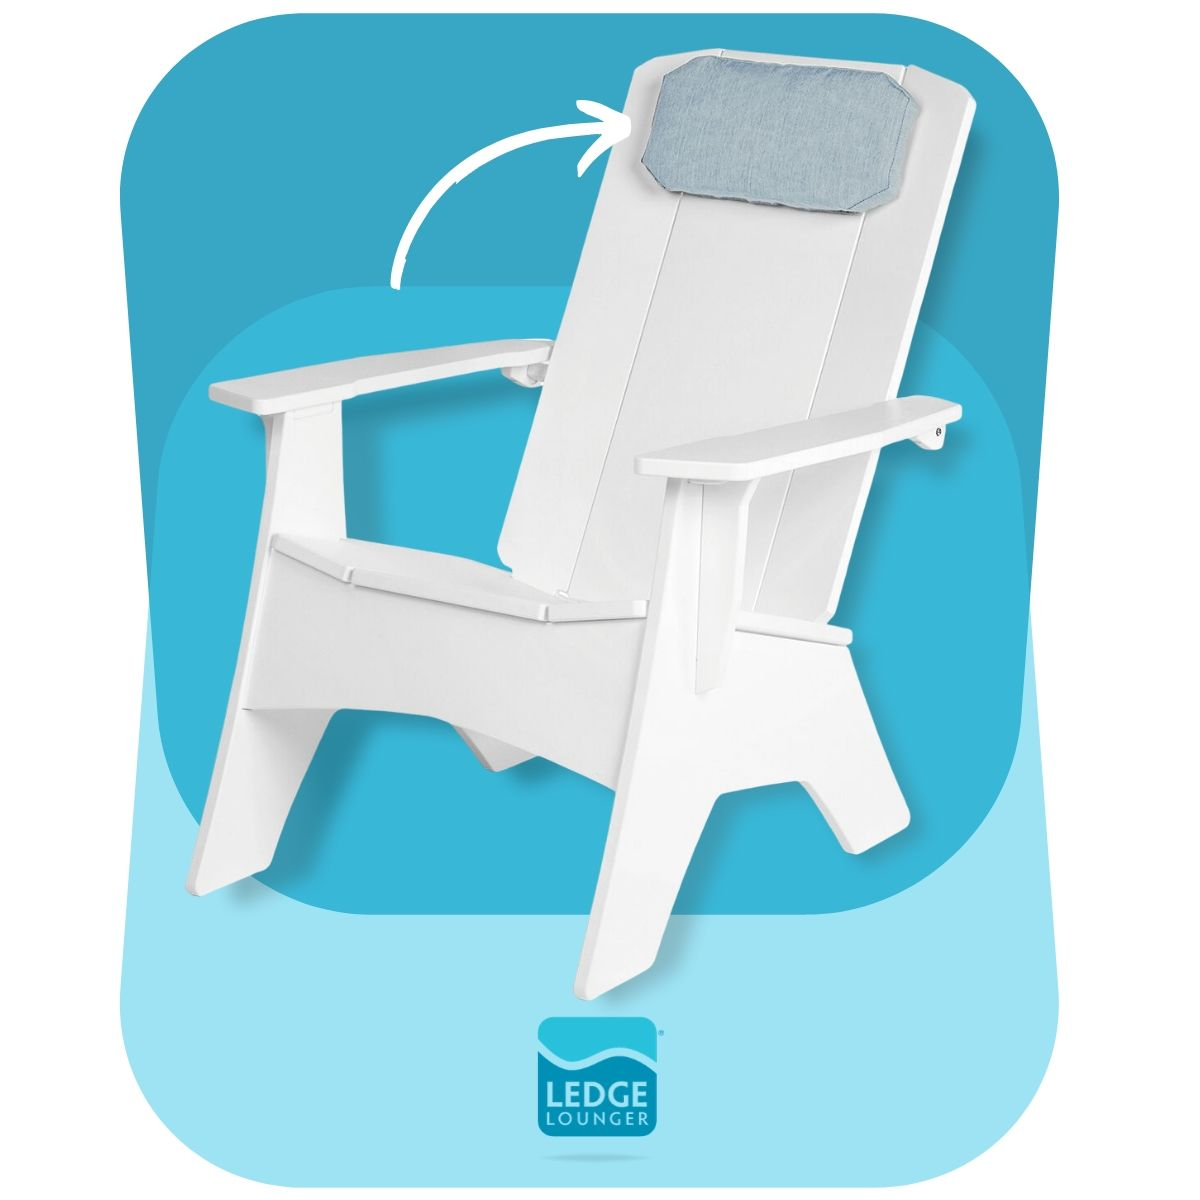 ledge-lounger-adirondack-headrest-pillow